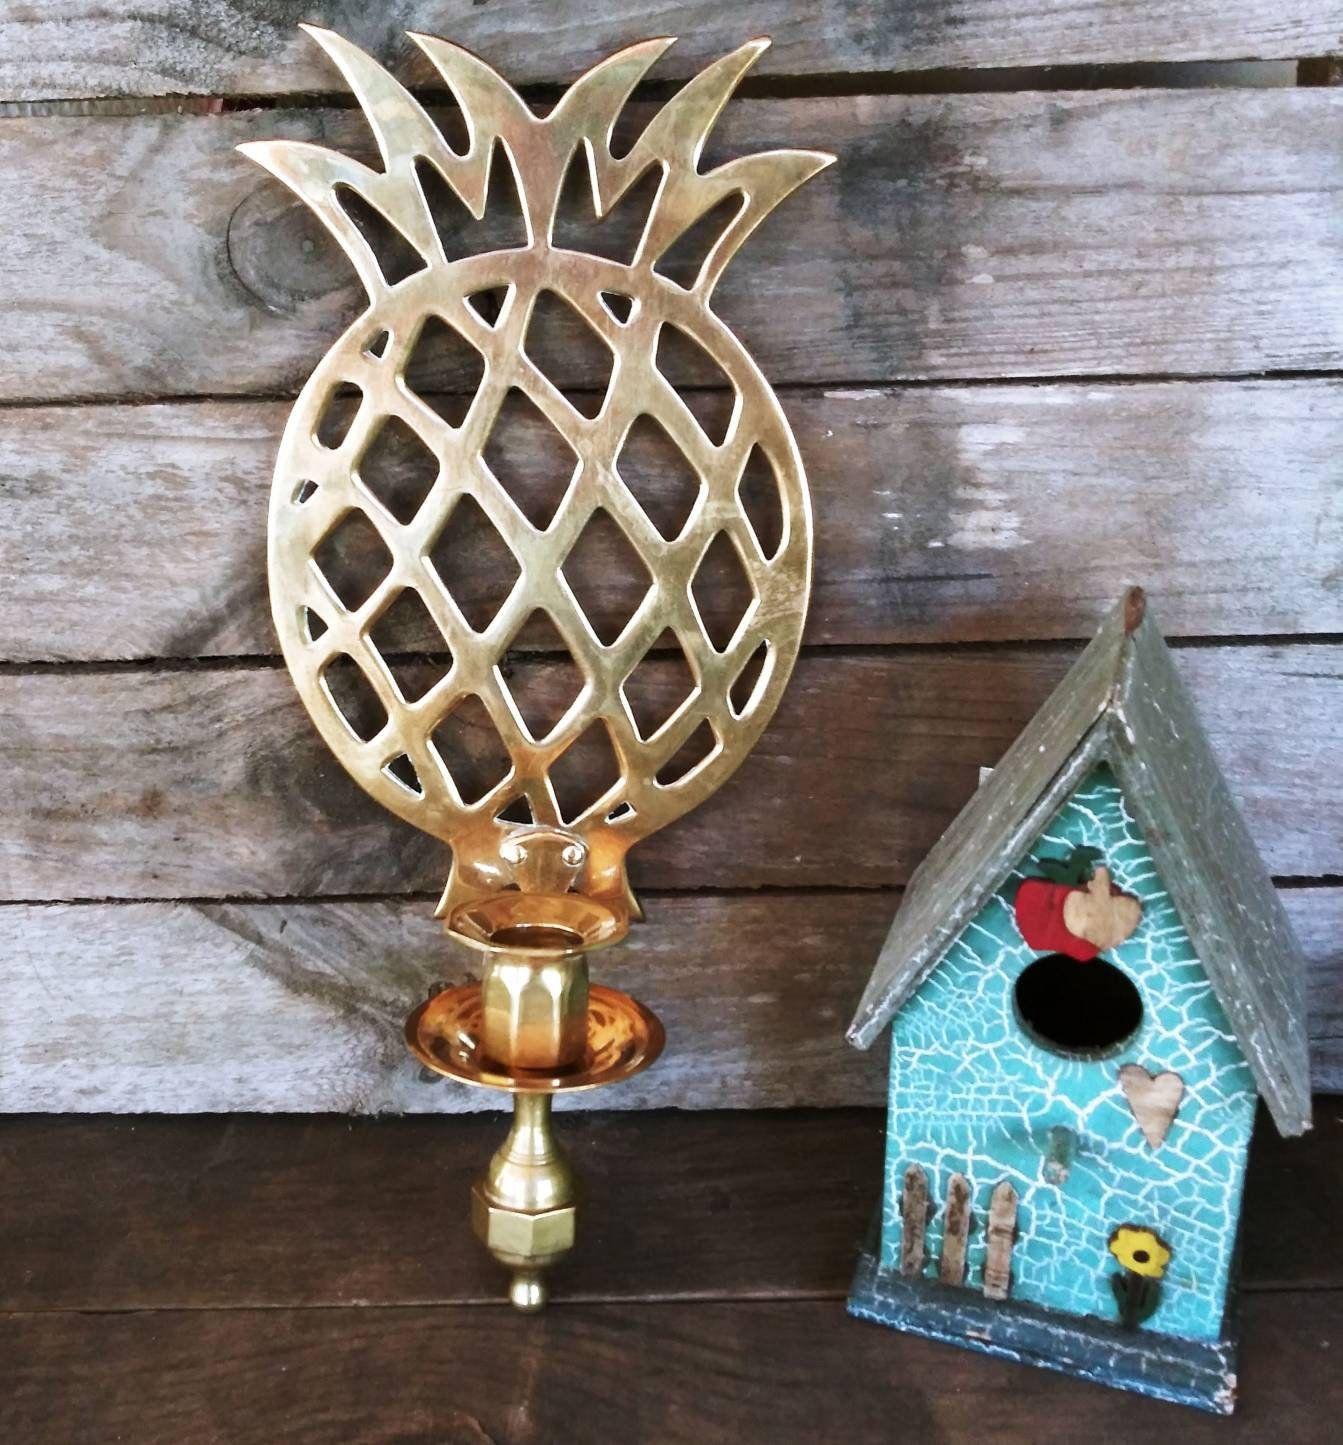 Vintage Retro Brass Pineapple Wall Sconce candle holder ... on Vintage Wall Sconce Candle Holder Decorating Ideas id=51877